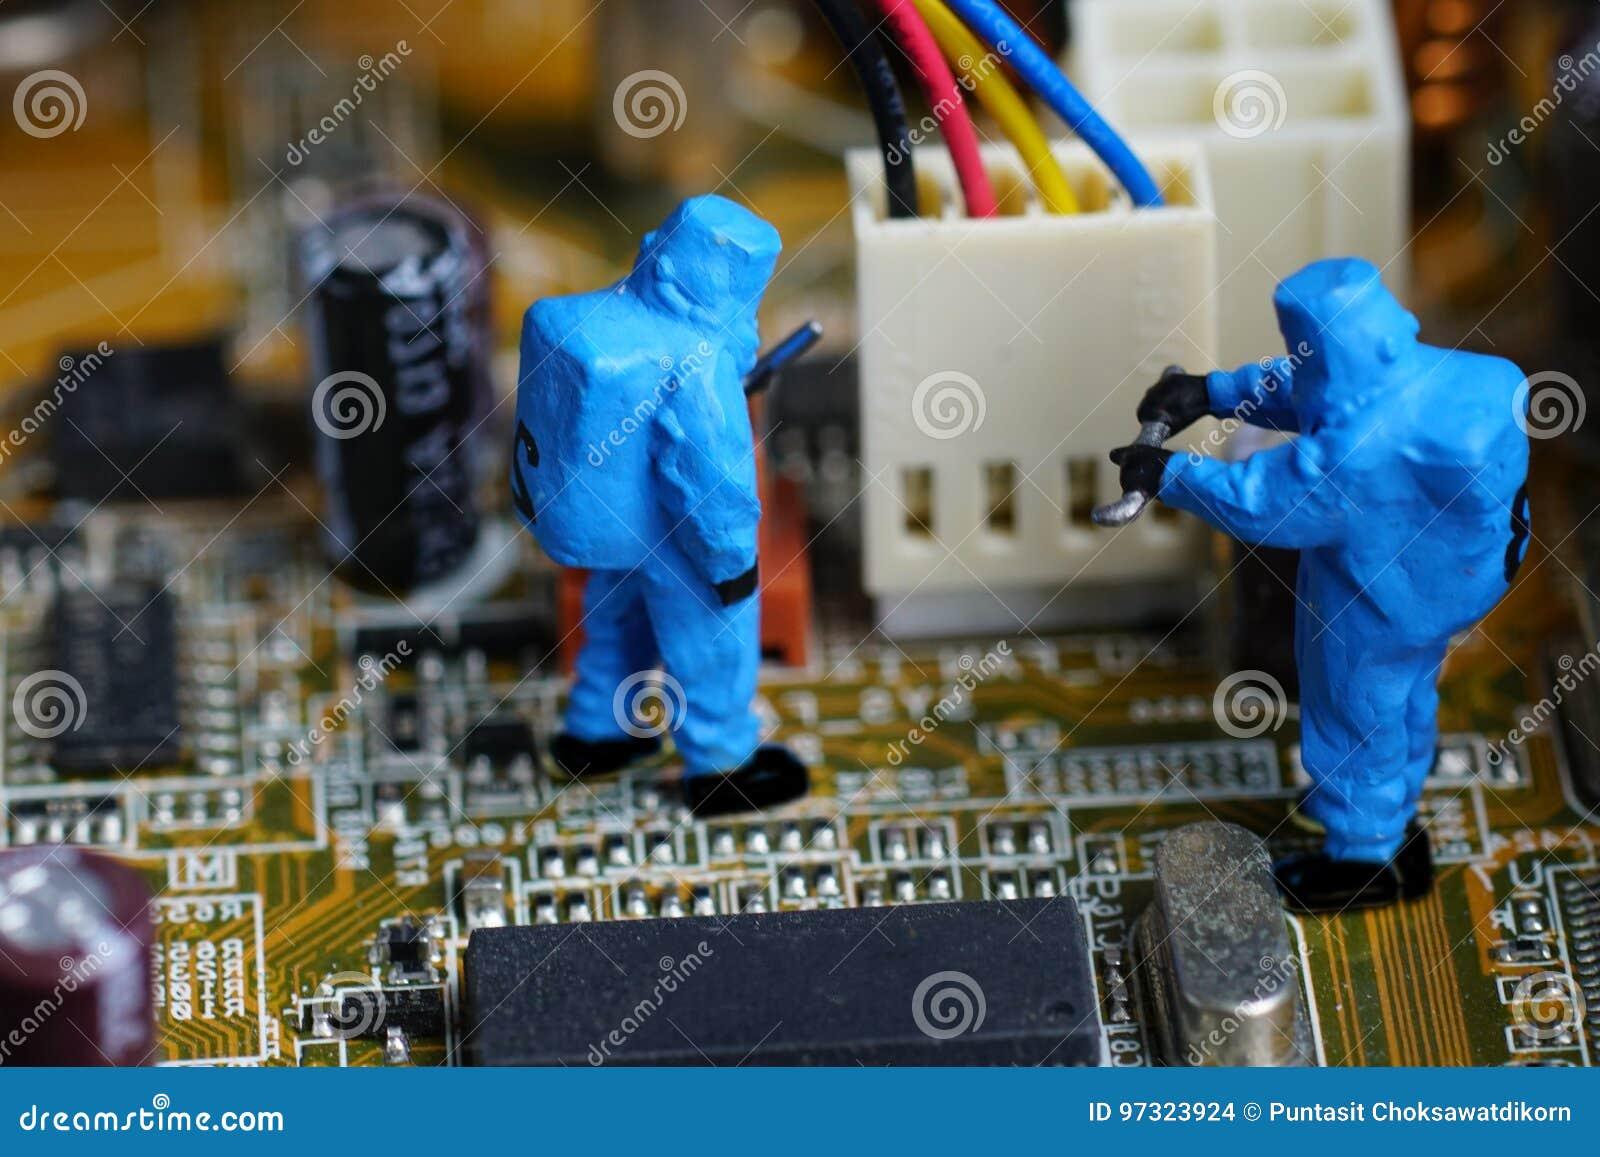 Technicians repair on computer mainboard.